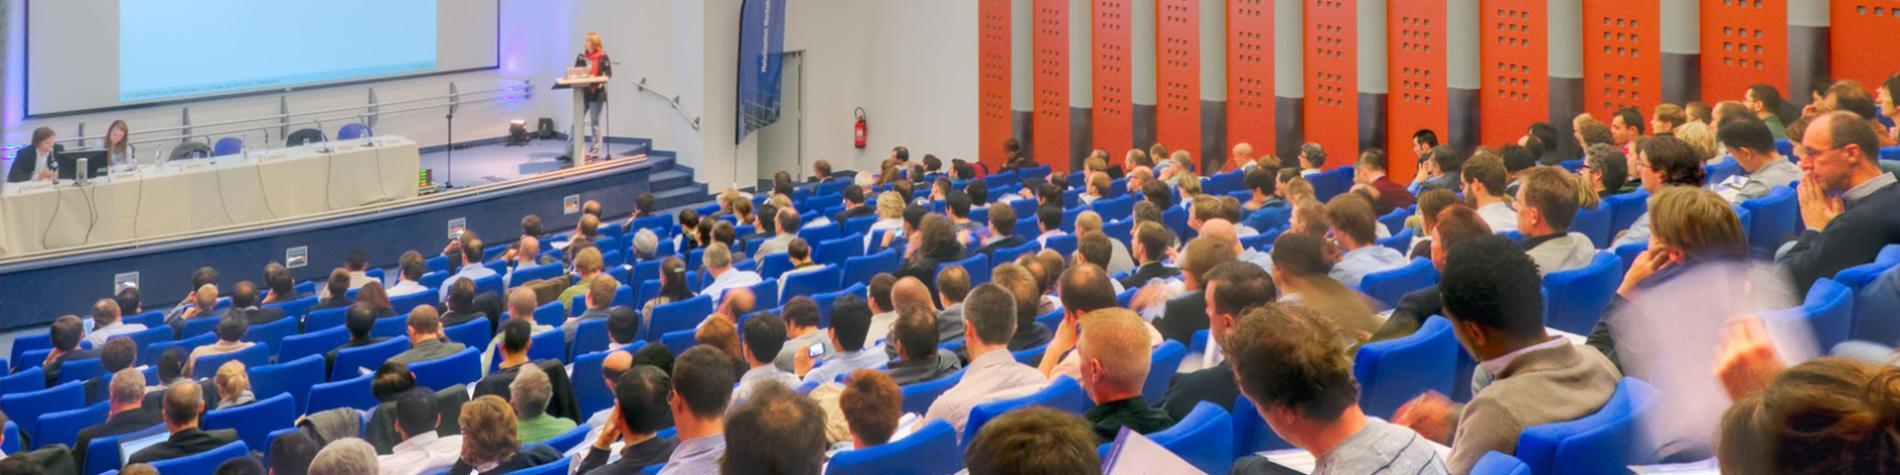 Espace - Meeting - Européen - CEME - Séminaires - Charleroi